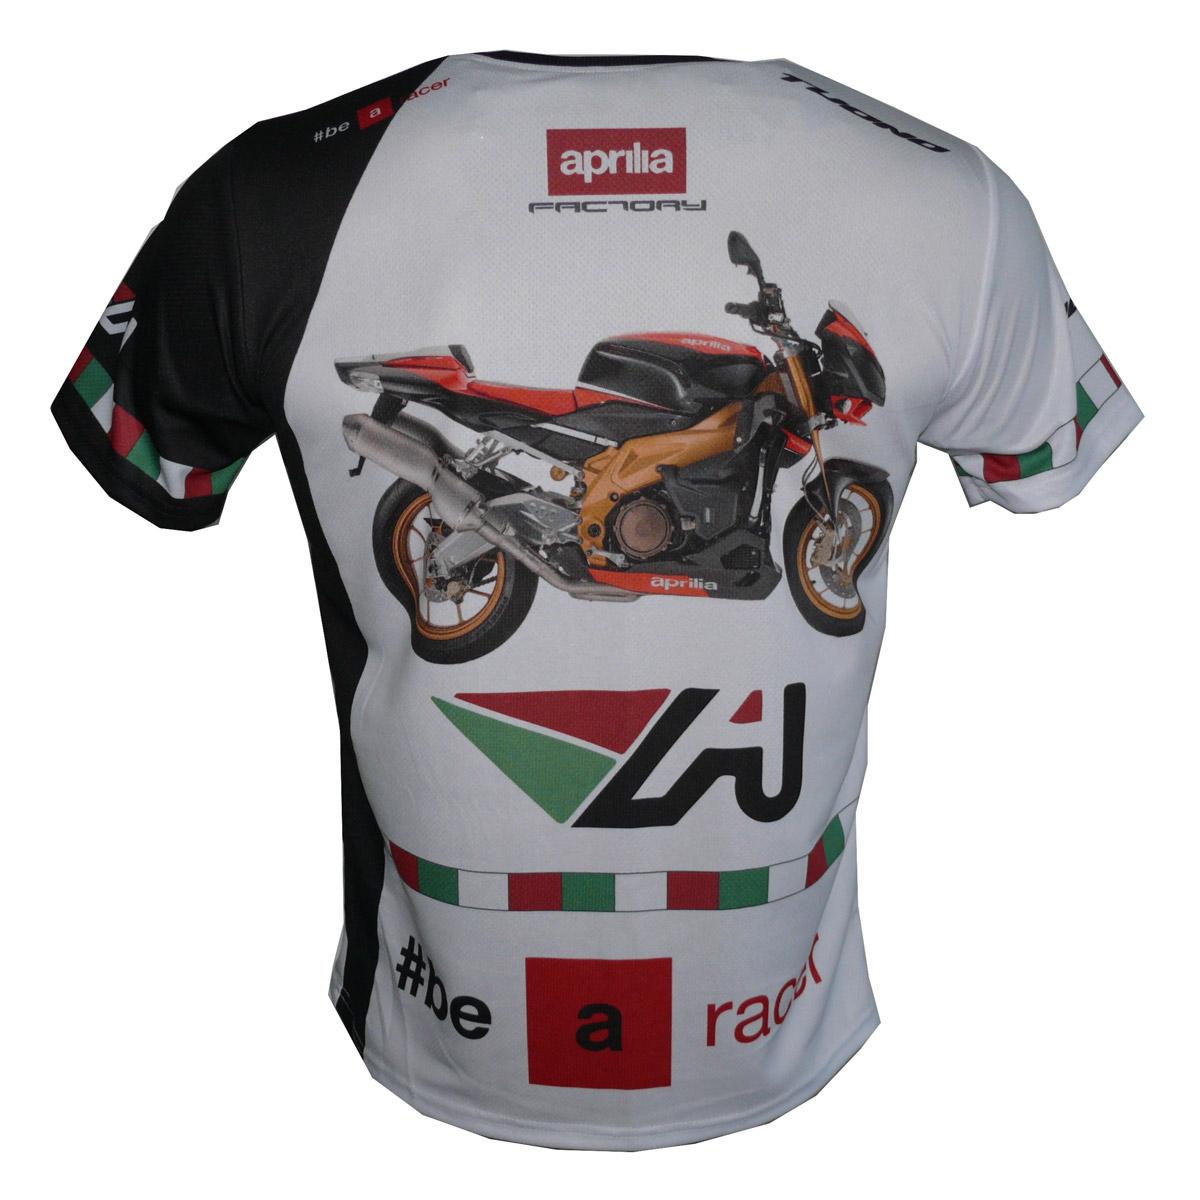 Aprilia tuono 1000r 2010 factory t-shirt